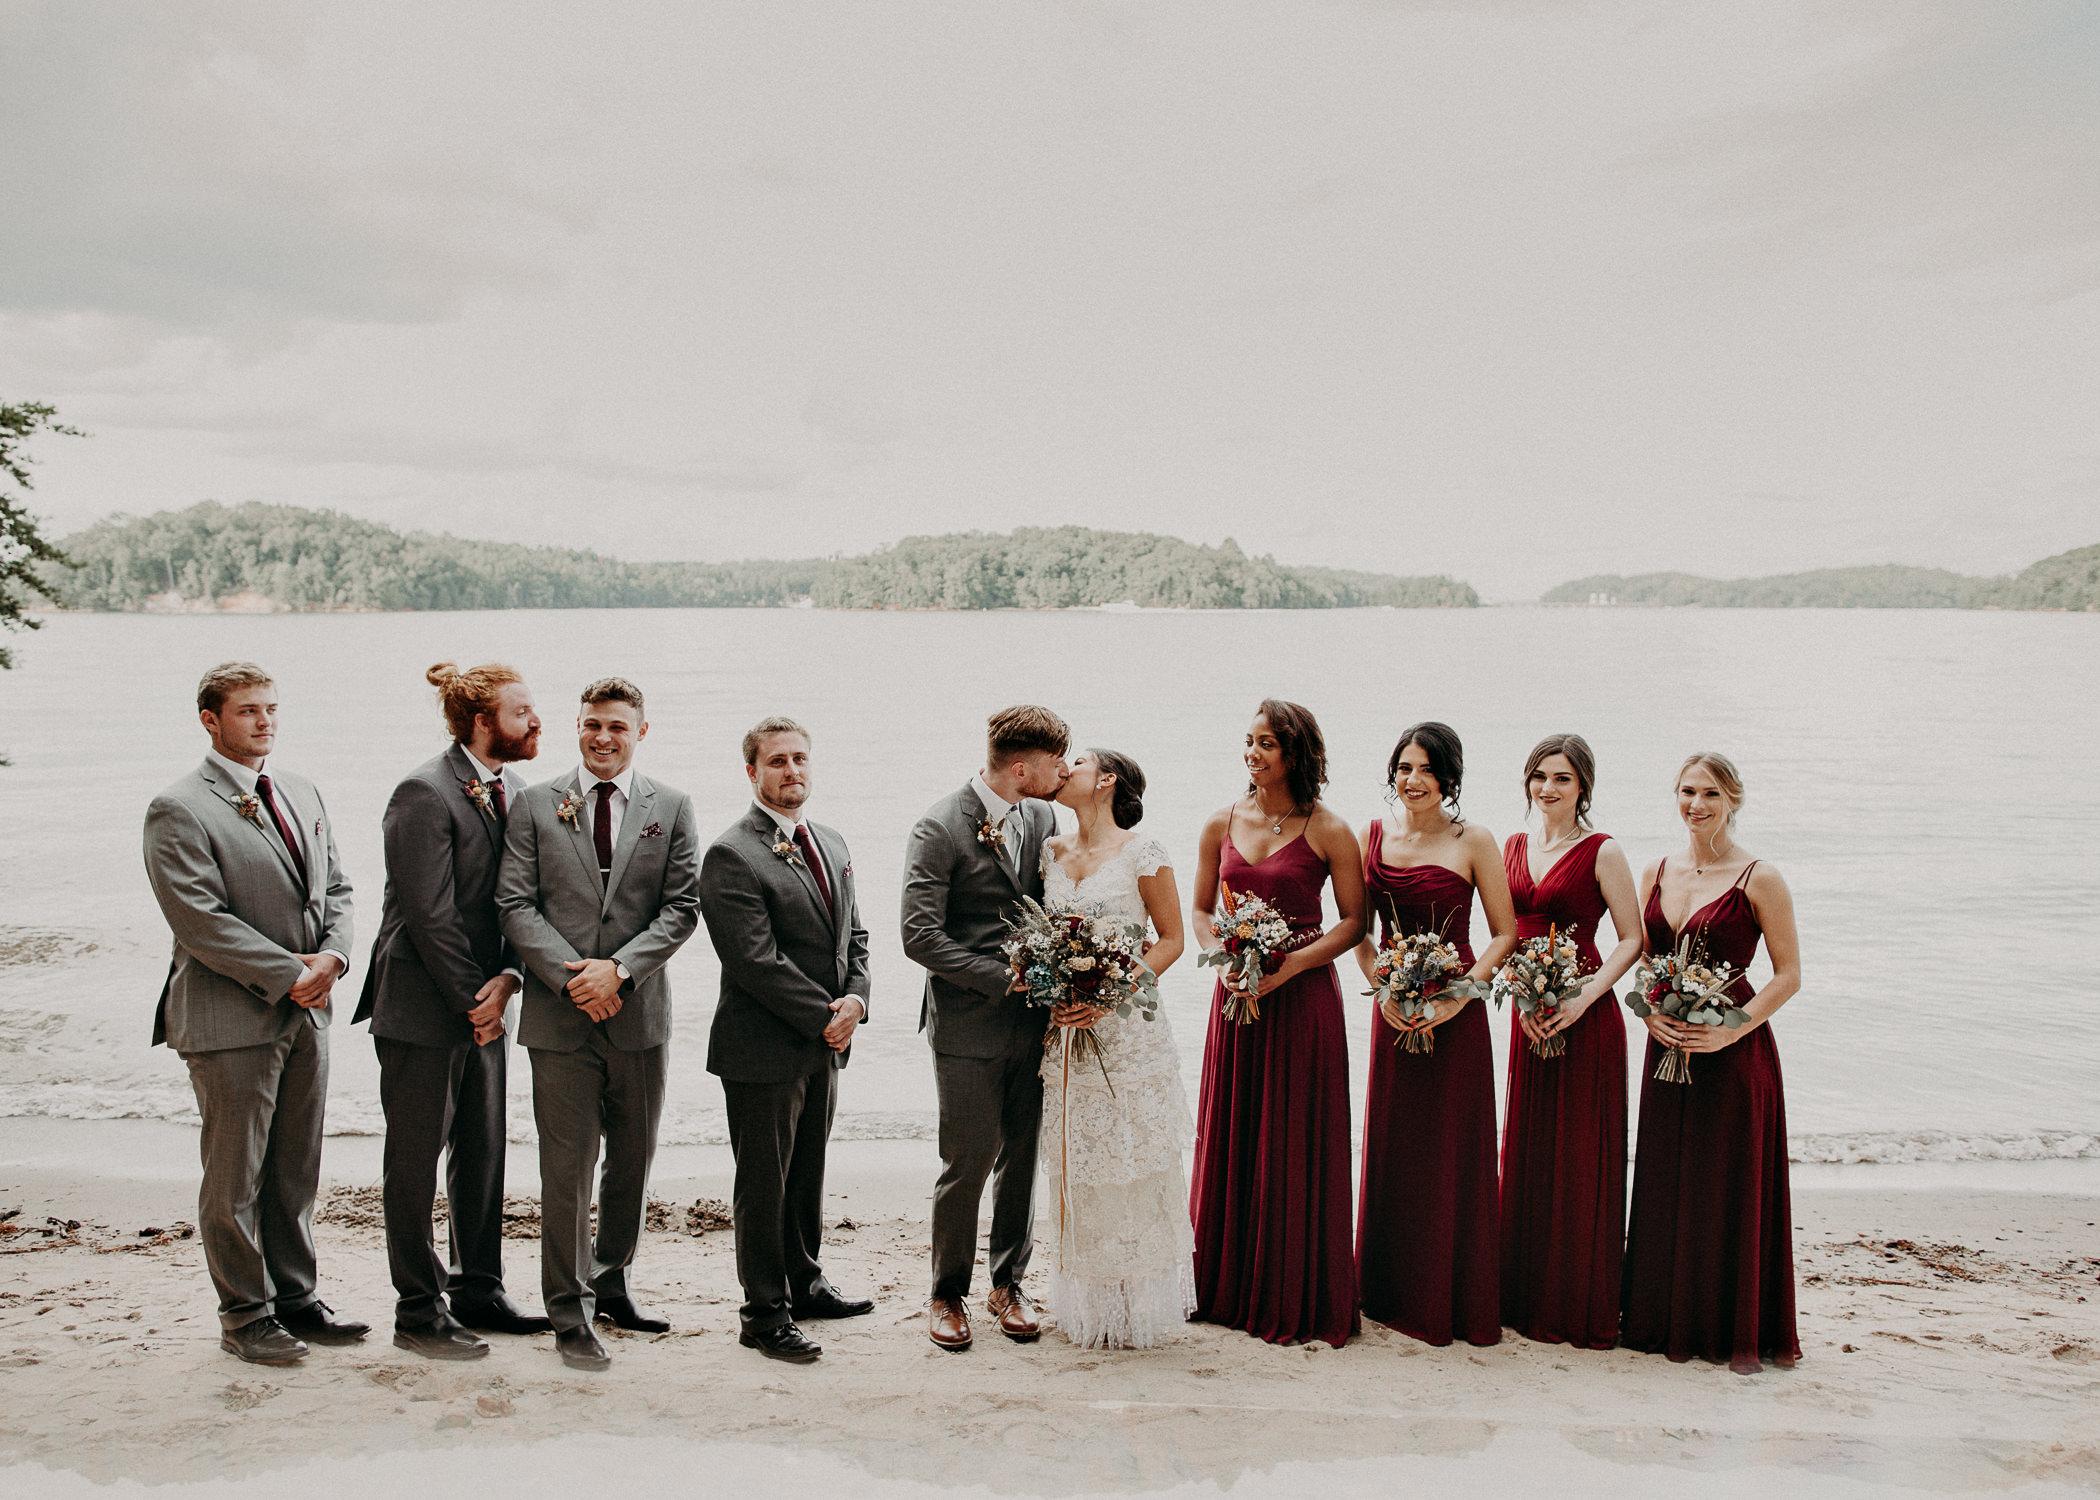 76 Bride & Groom Portraits before the ceremony on wedding day - Atlanta Wedding Photographer .jpg